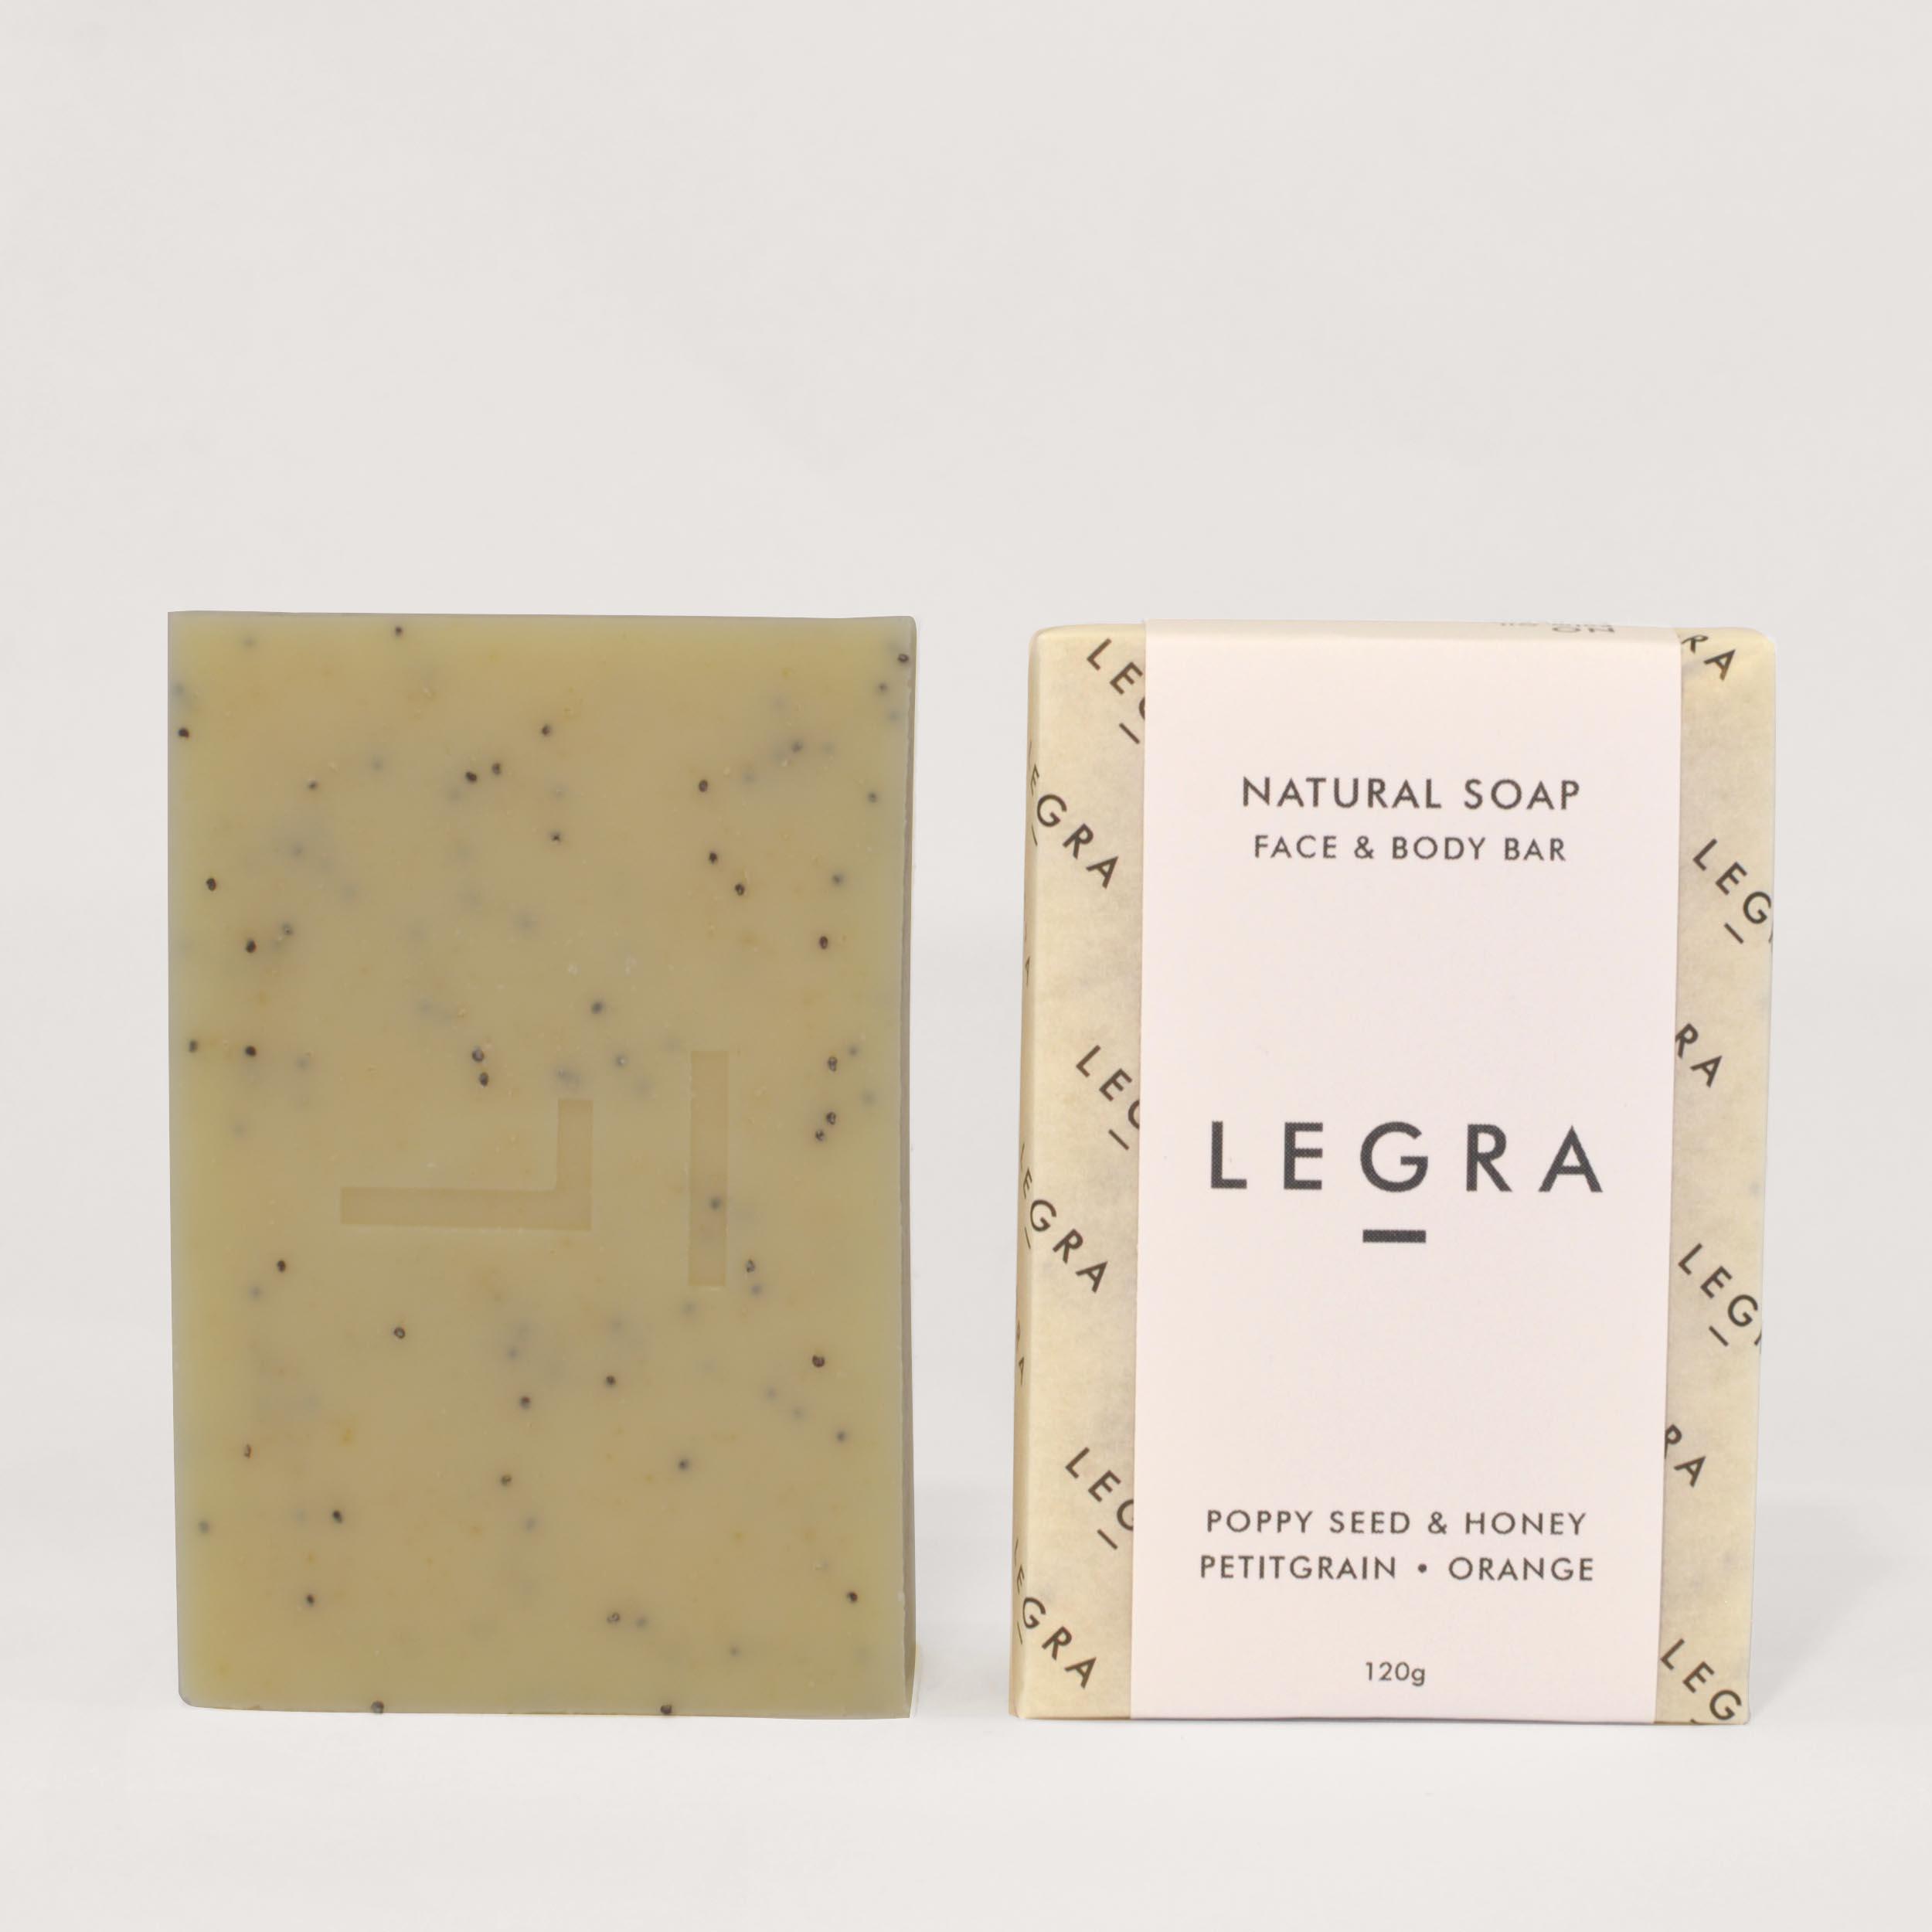 Honey & Poppyseed Soap with Petitgrain, Orange & Patchoulli